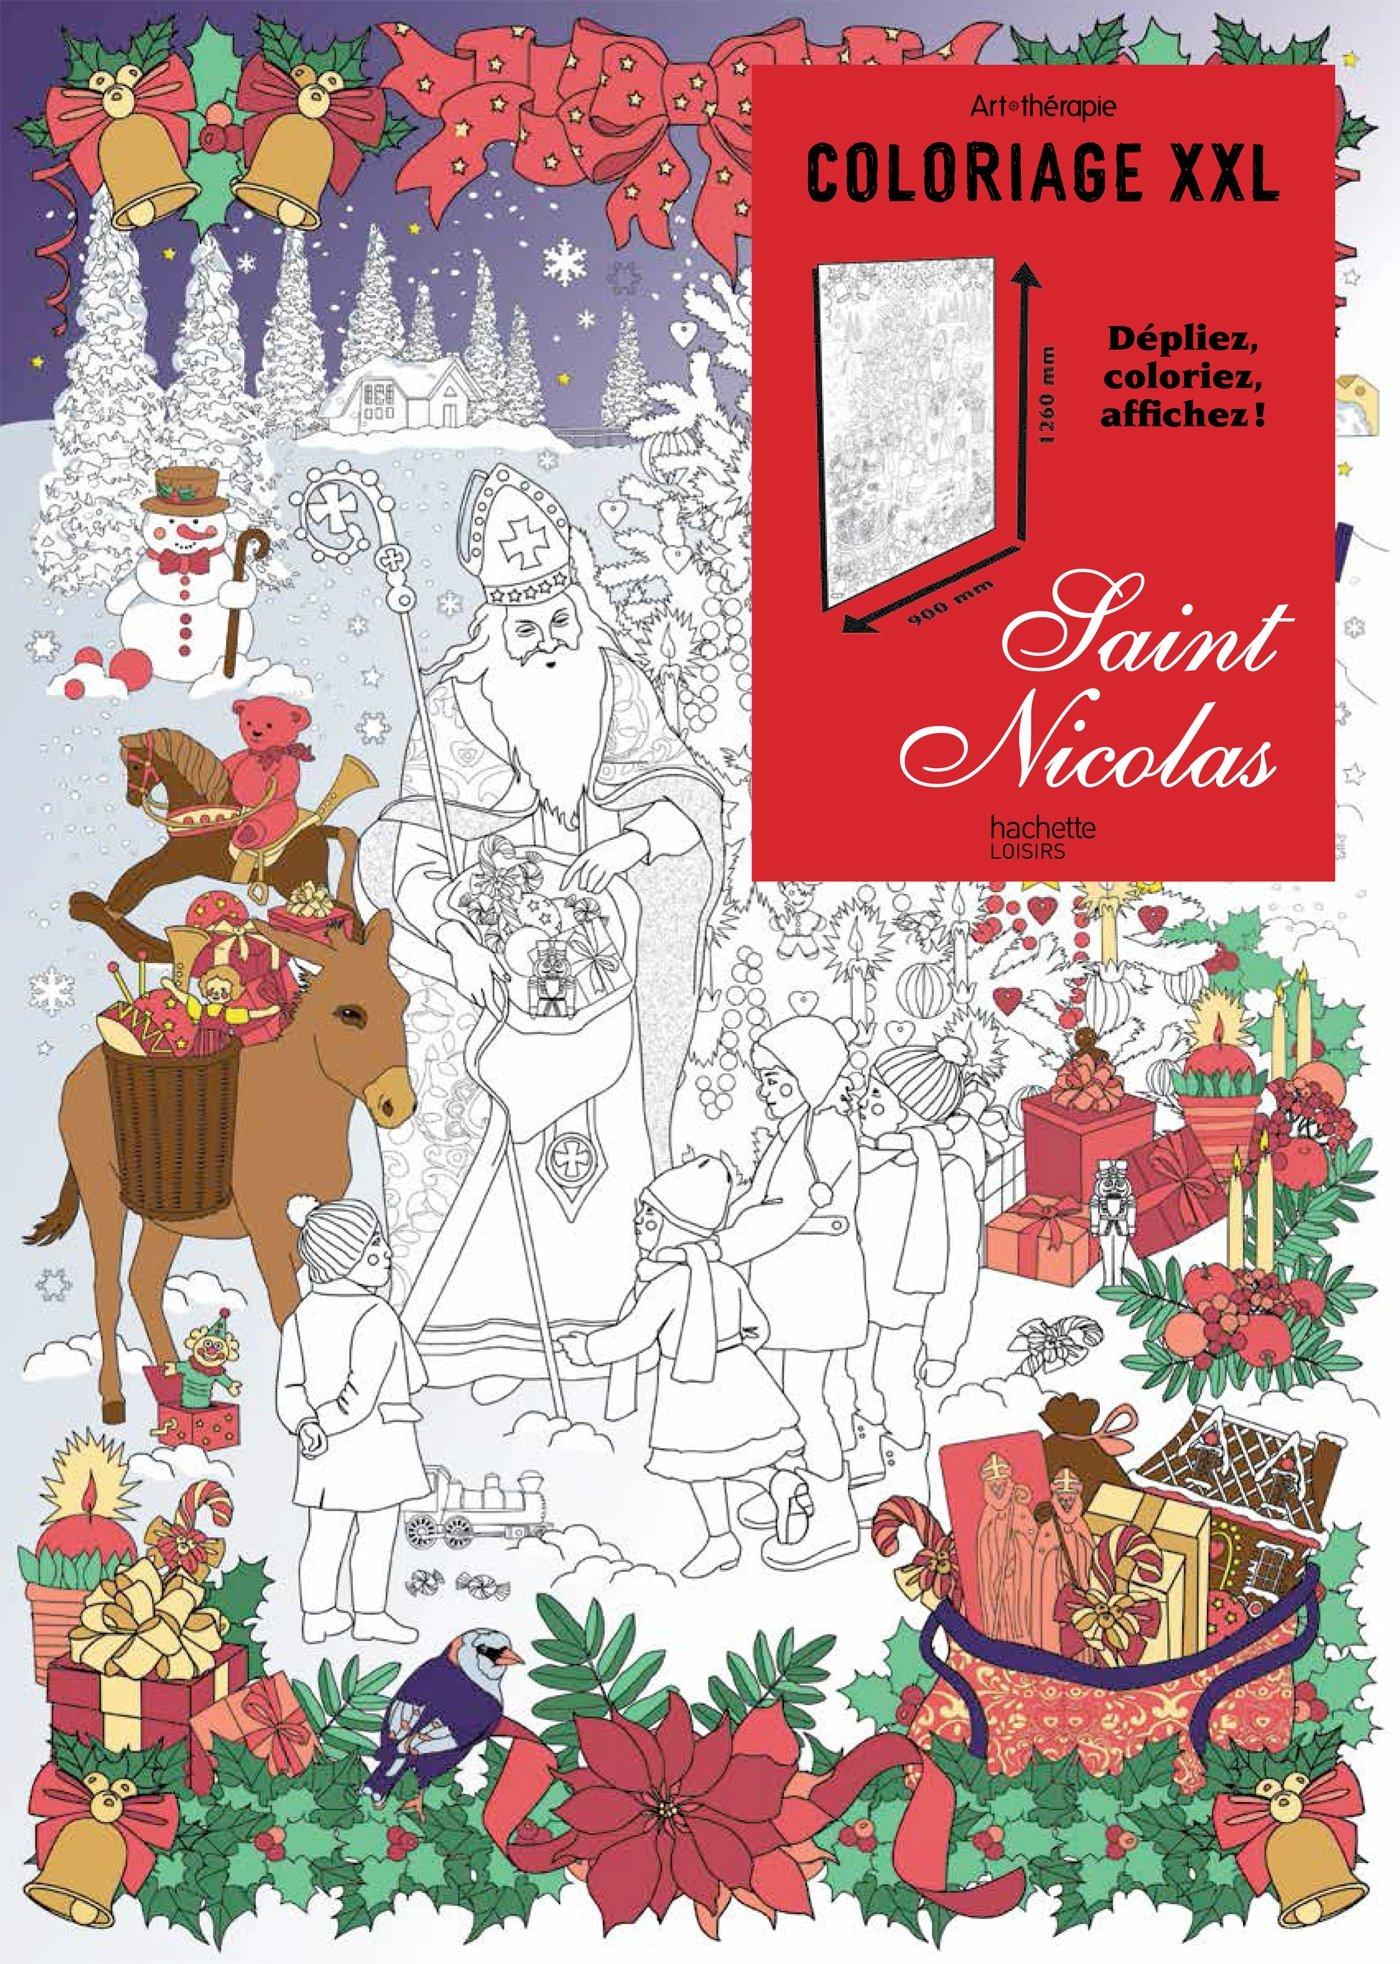 Coloriage Xxl Saint Nicolas Loisirs Sports Passions Kostanek Lidia 9782010090974 Amazon Com Books